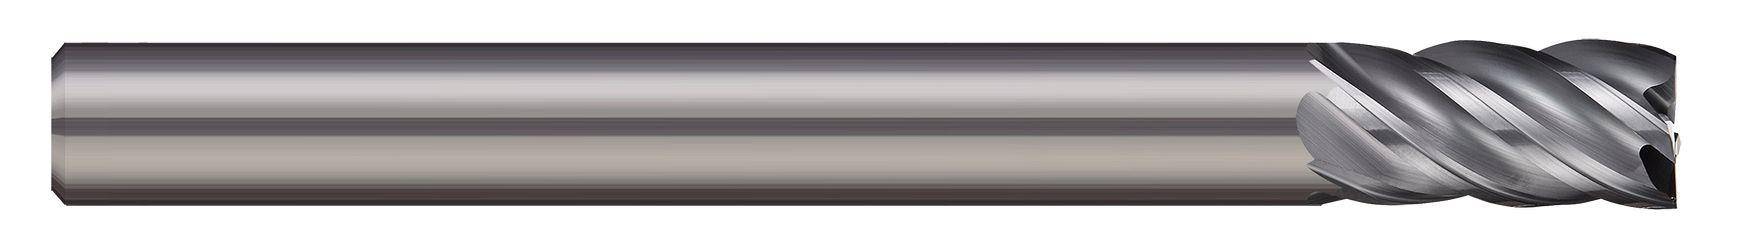 tool-details-VHM-312-5